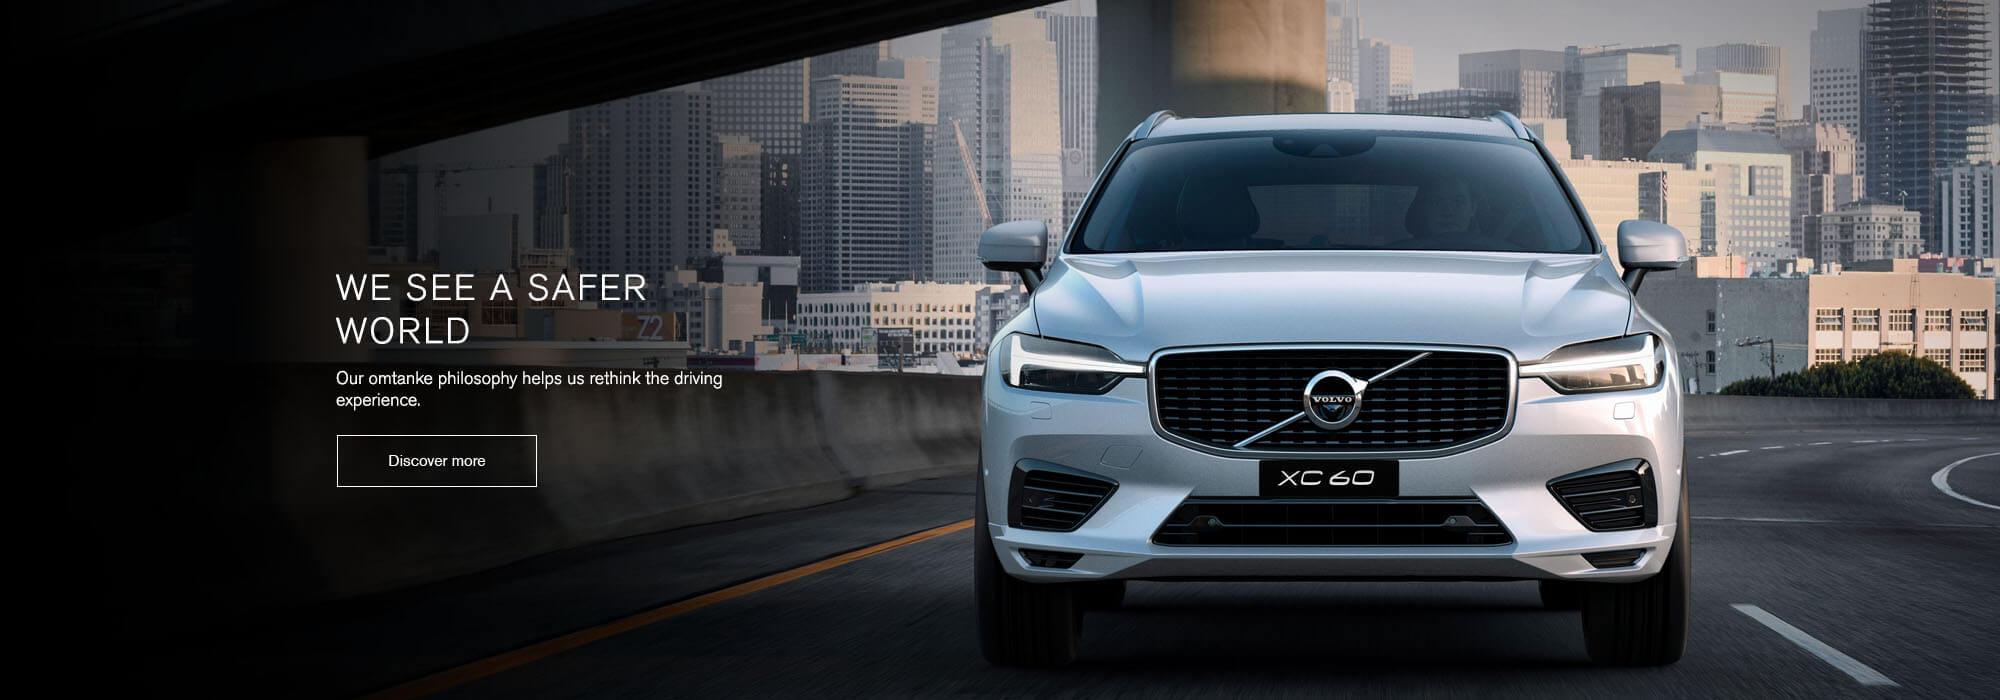 Volvo Dealer Geelong - Volvo Cars Geelong